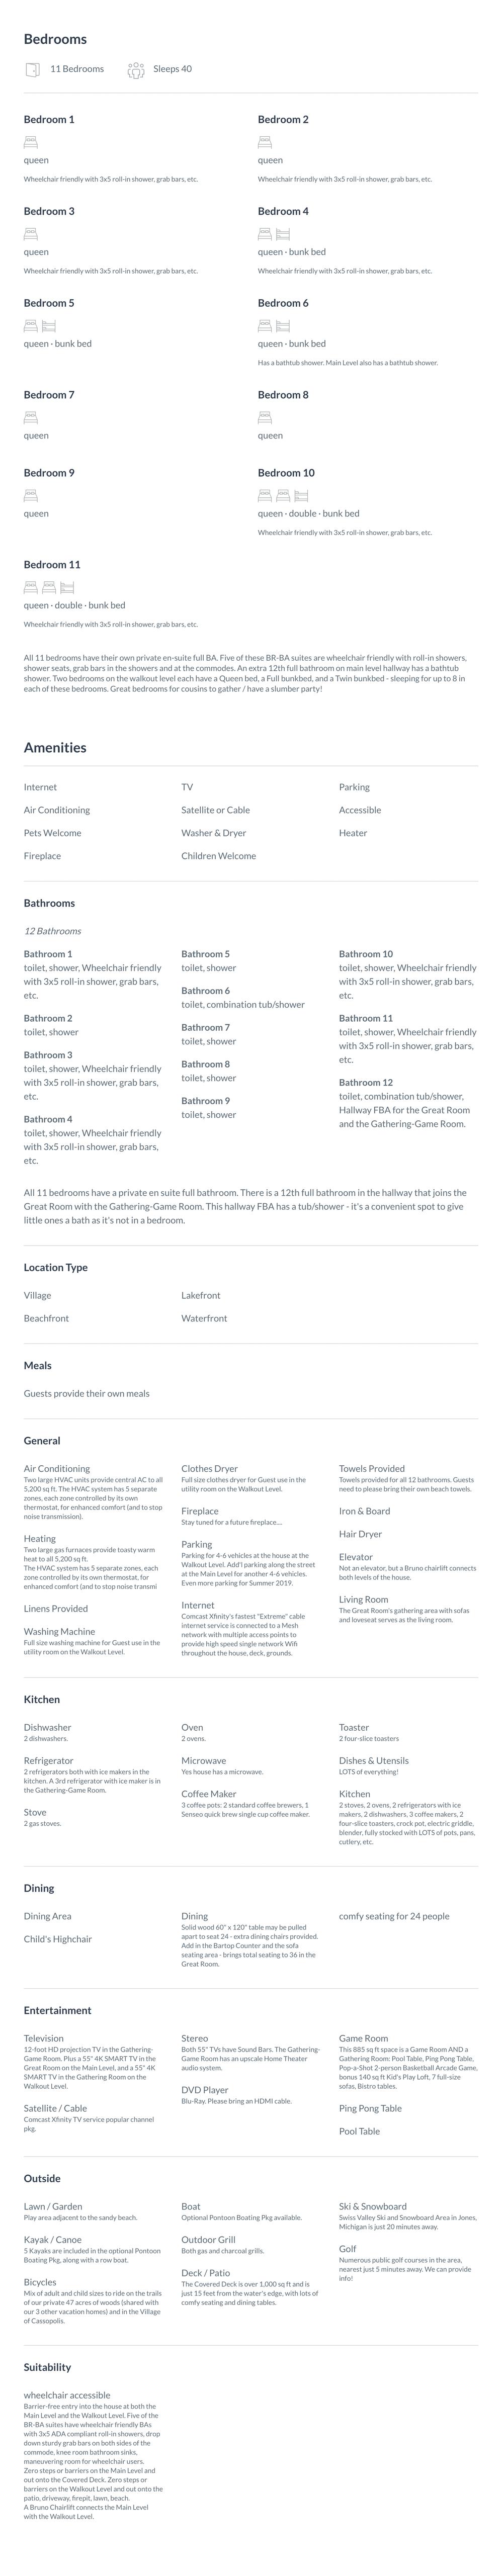 Blue Spruce Lodge - All Details.png